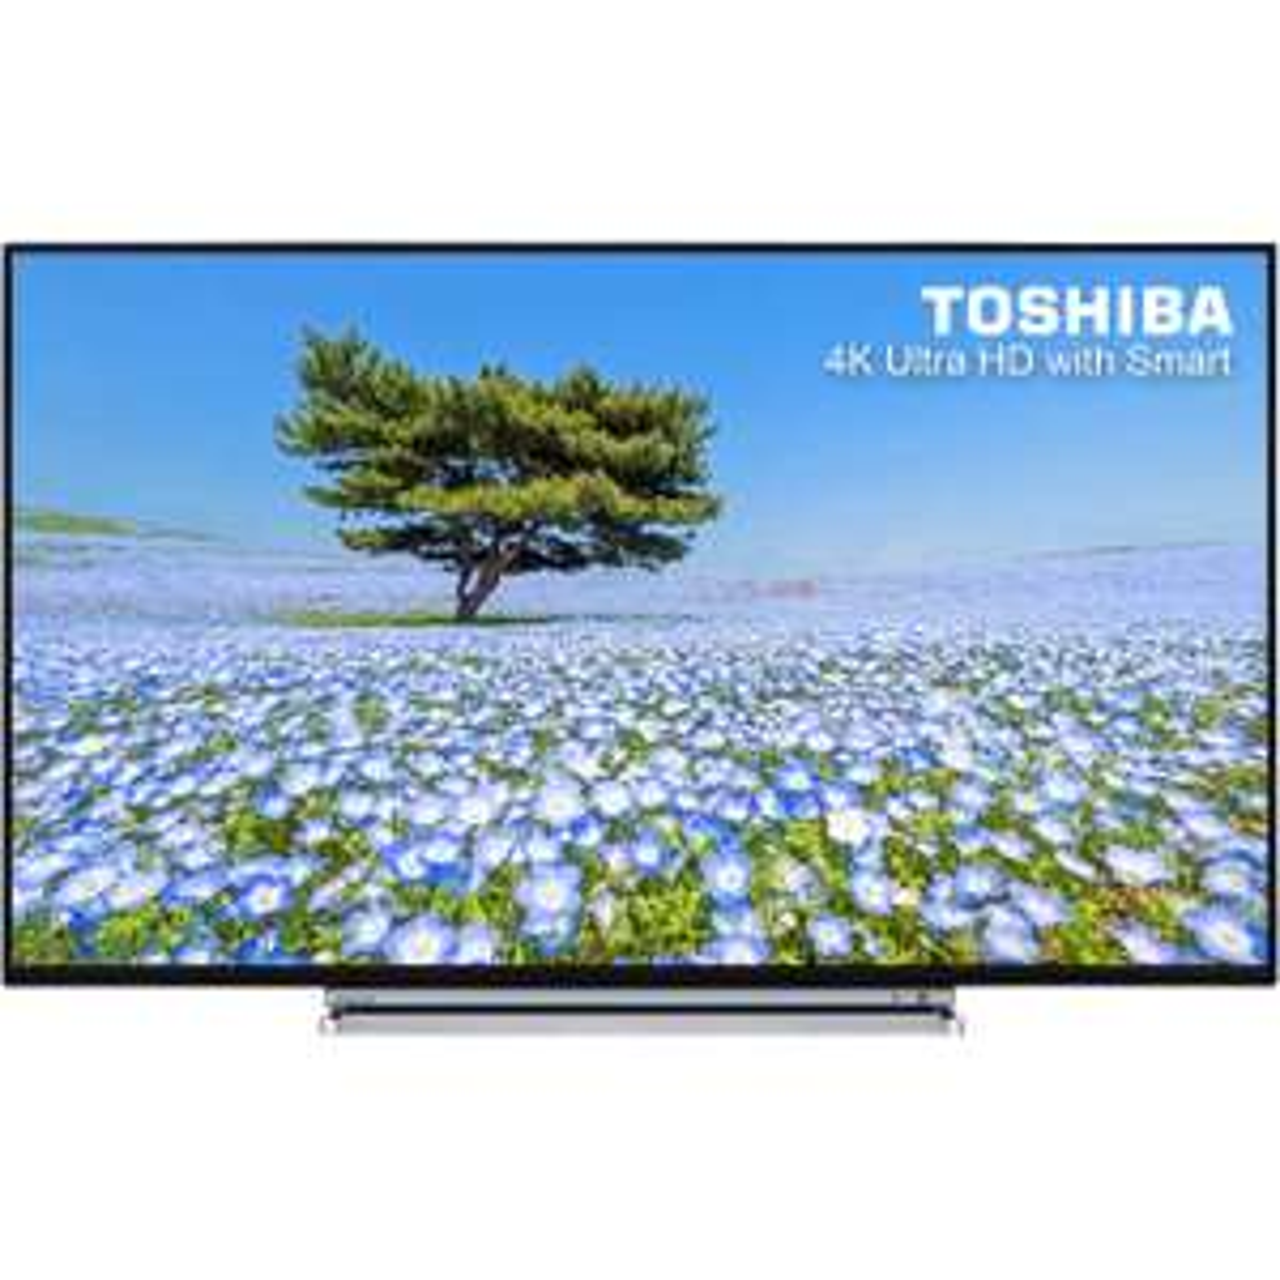 "Toshiba 49U6763DB 49"" Freeview HD and Freeview Play Smart 4K Ultra HD TV - Black / Chrome £349 - ao.com"